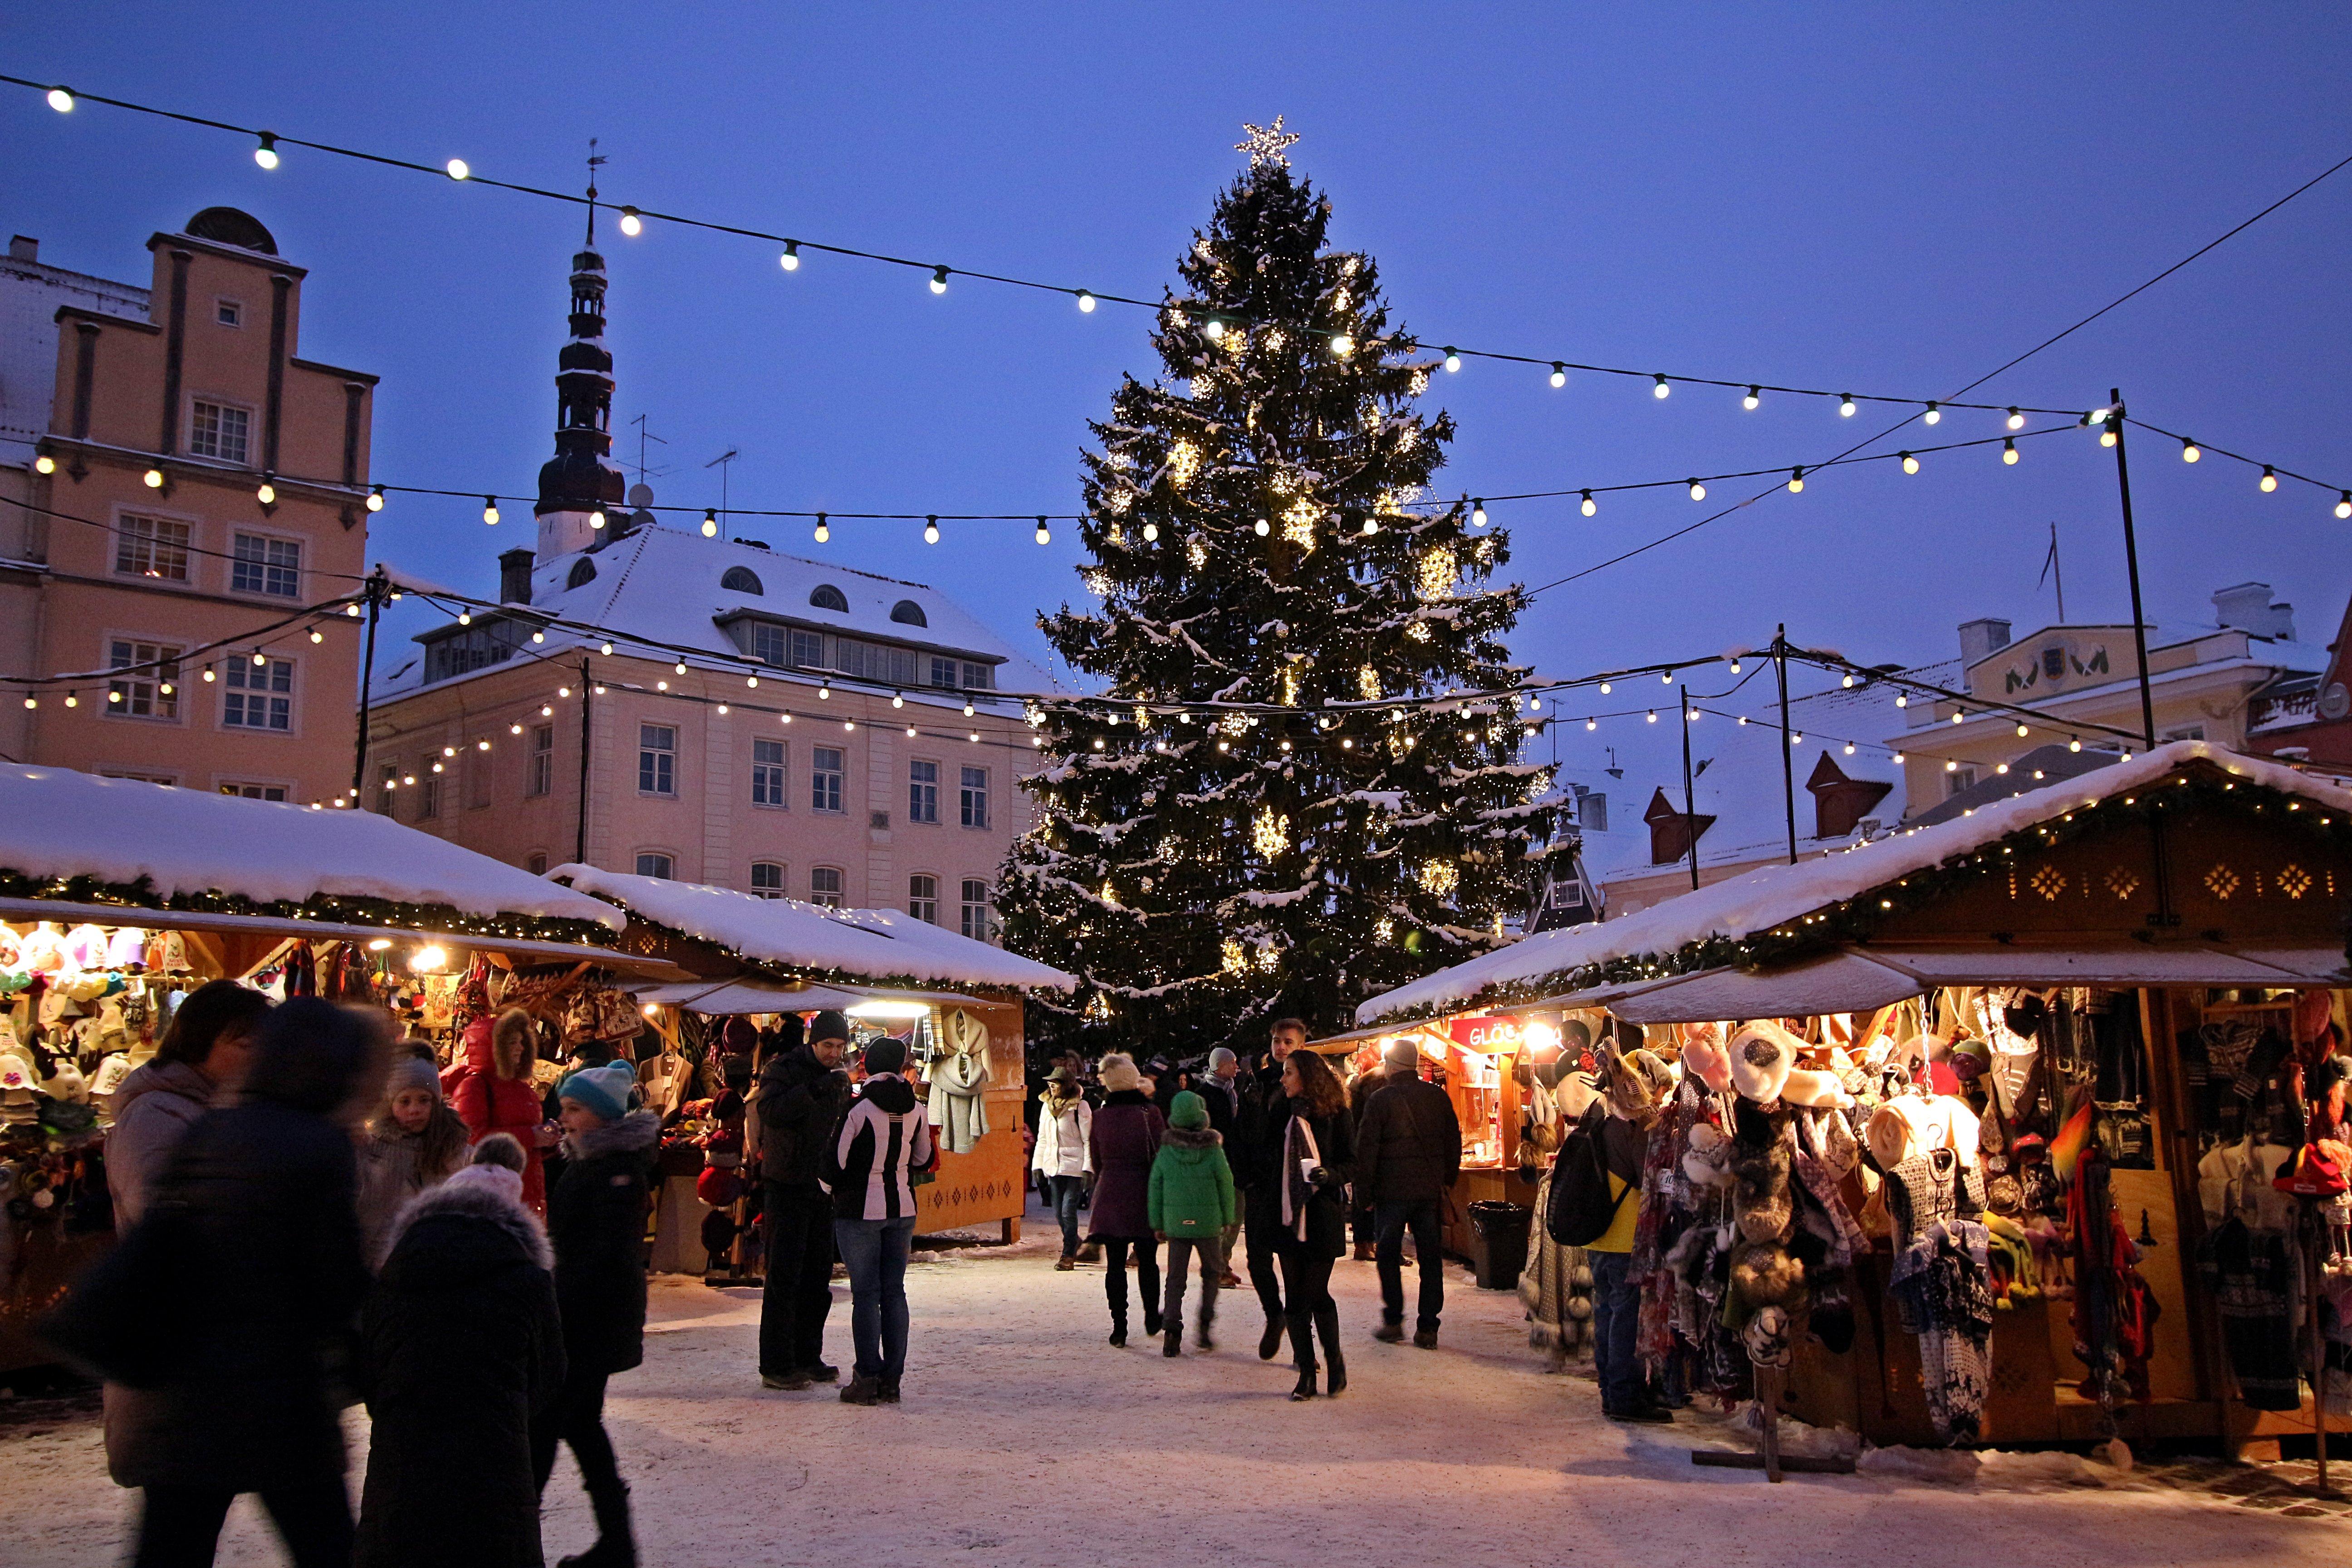 Christmas Market in Tallinn by Marit & Toomas Hinnosaar (CC)